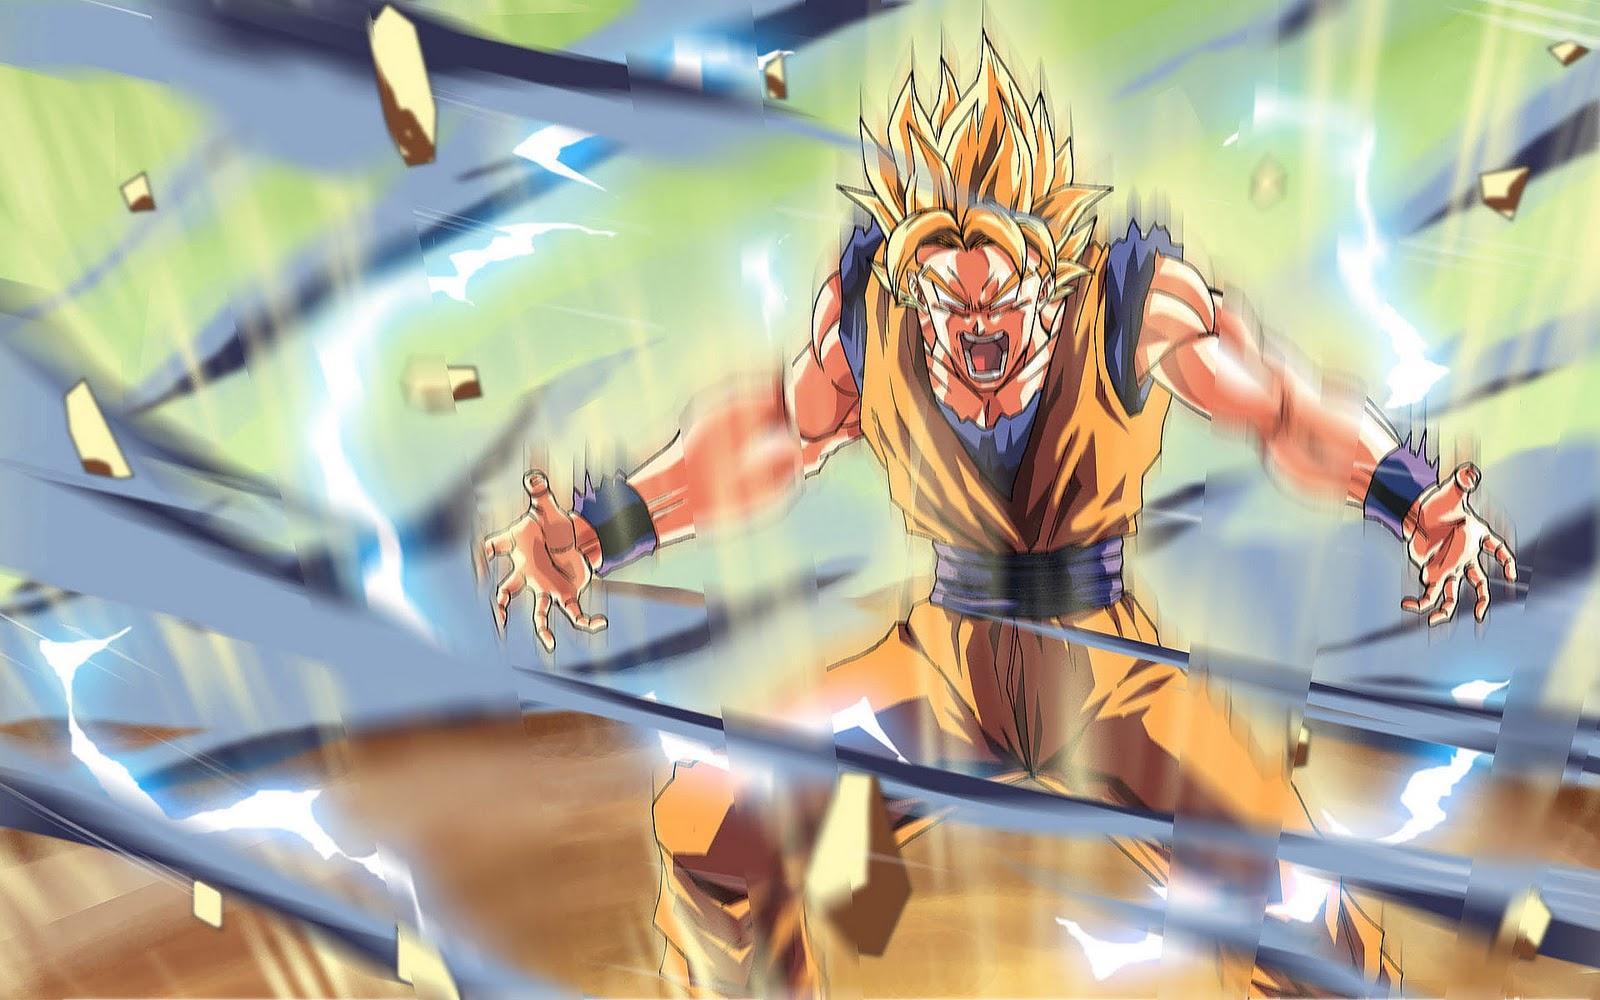 Dragonball Z Wallpaper Power Of Super Saiyan By Yasinargu On